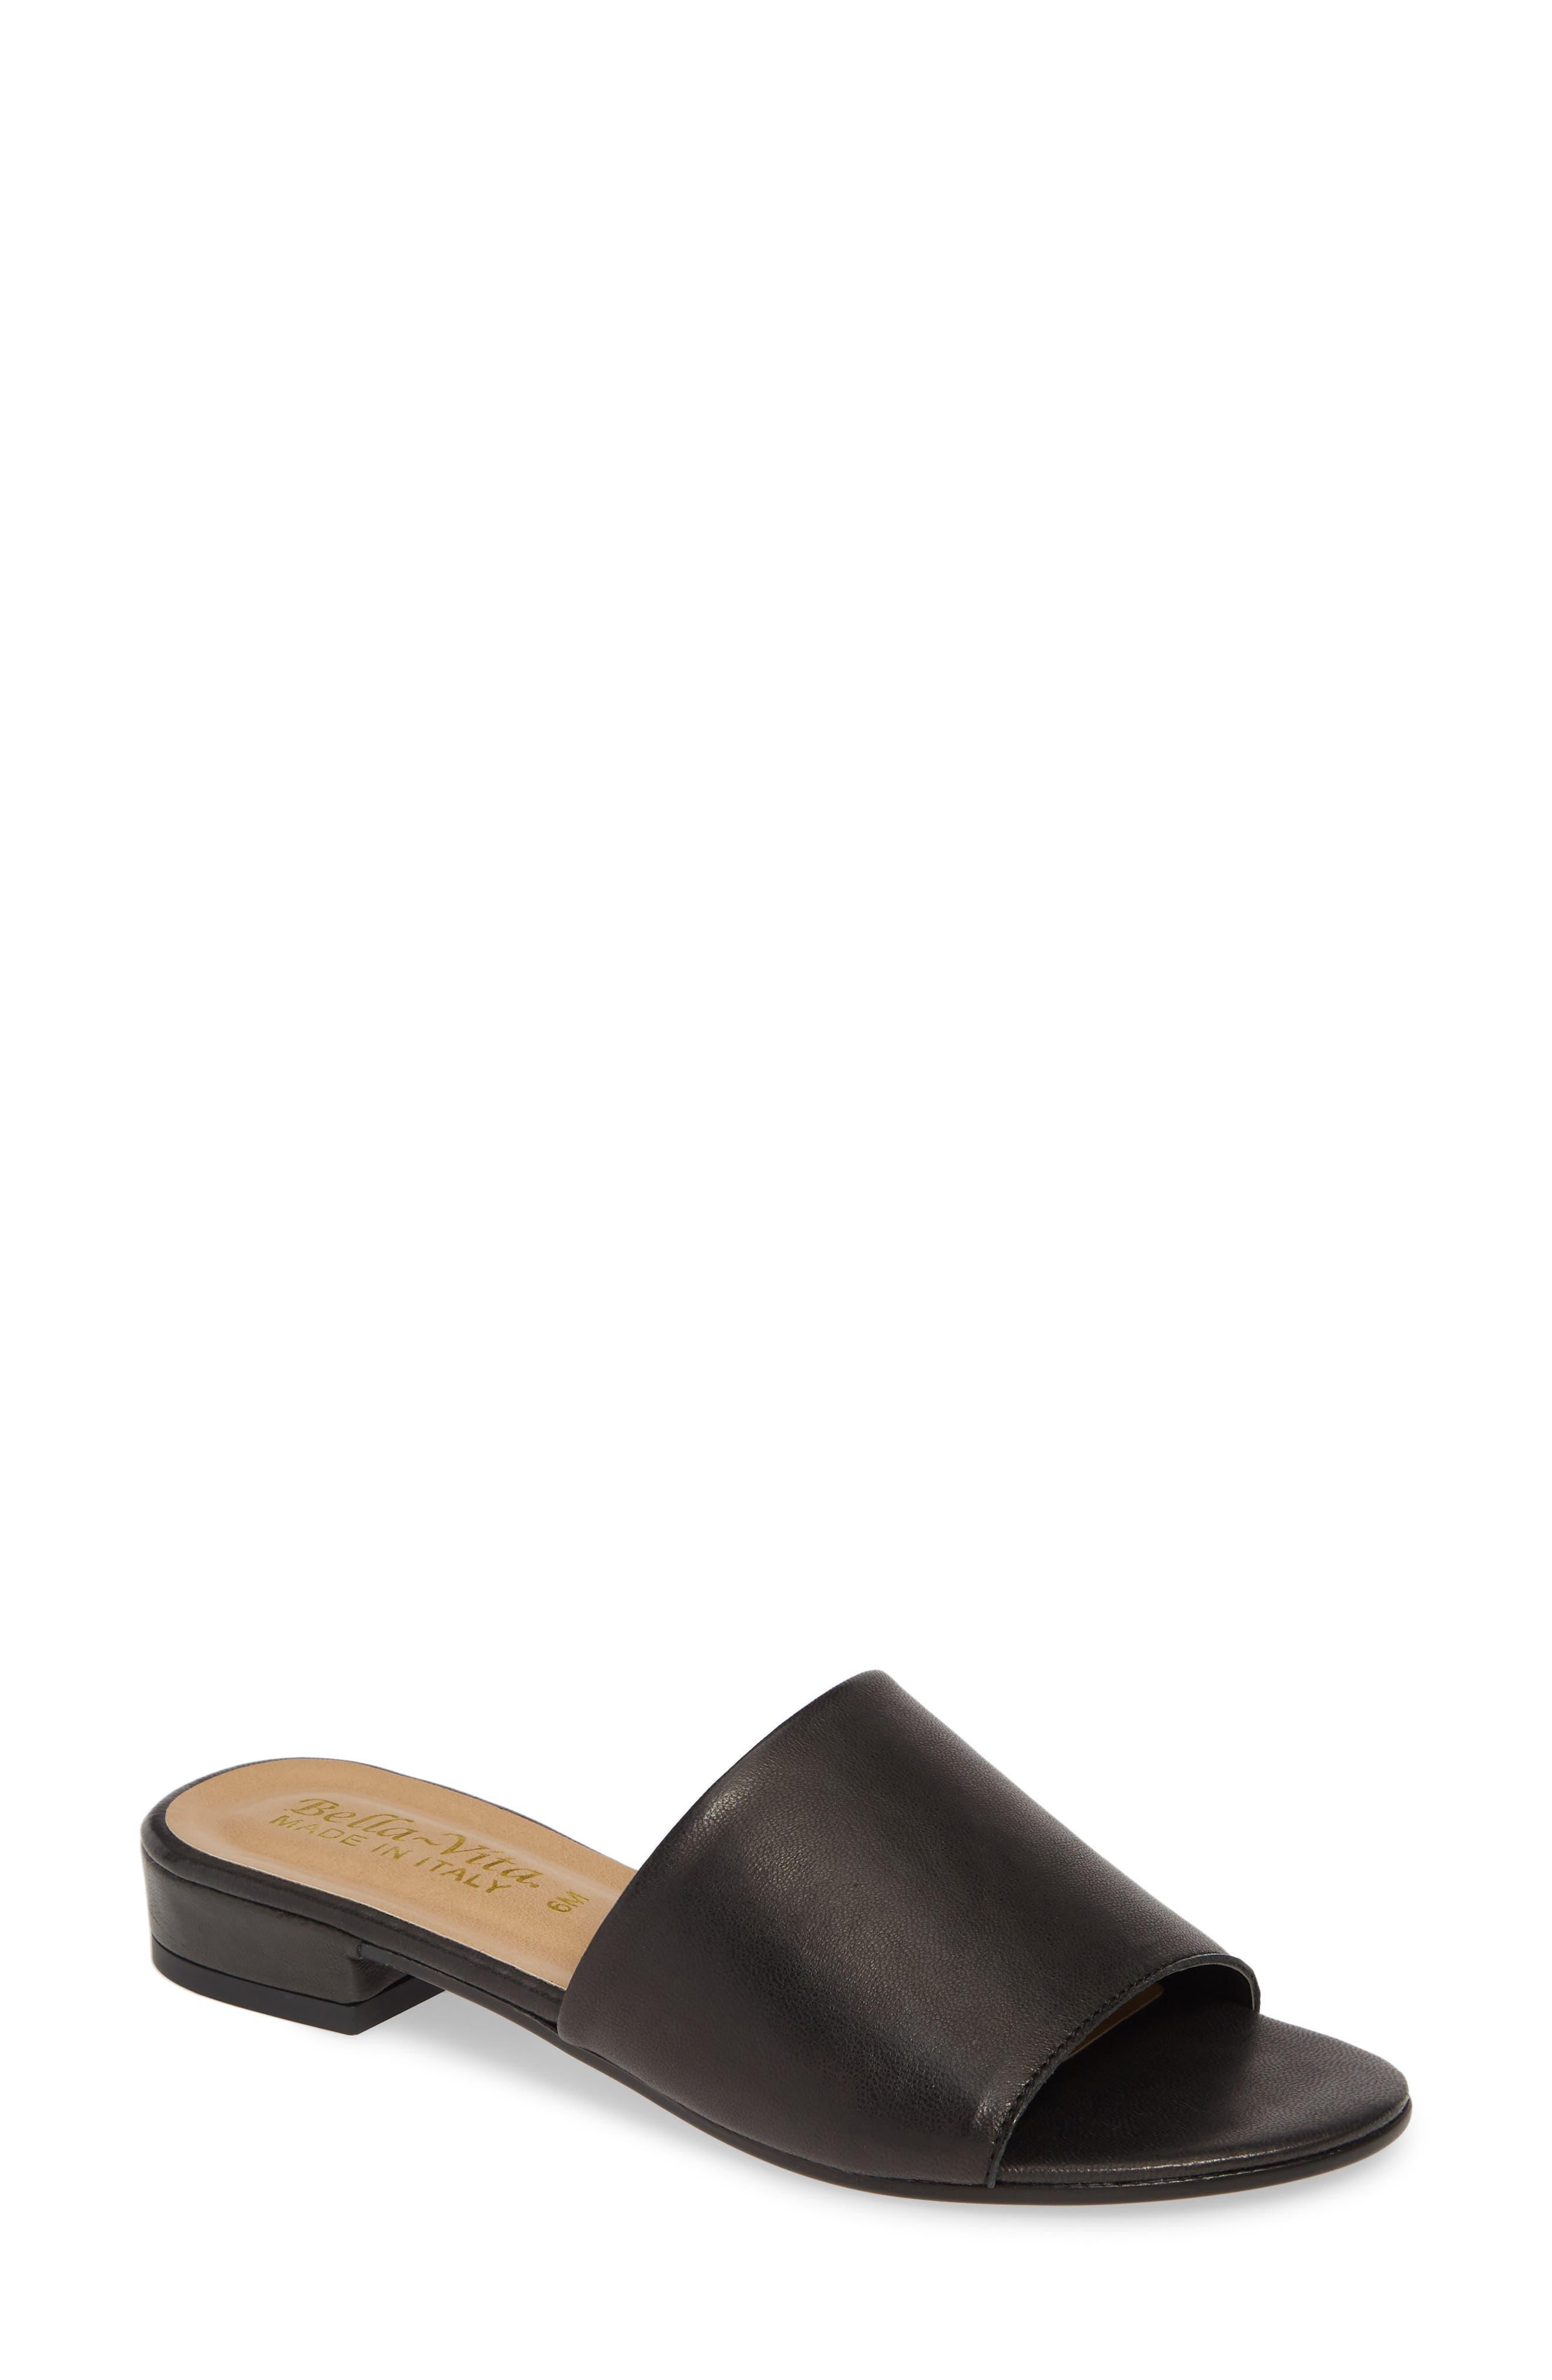 BELLA VITA, Slide Sandal, Main thumbnail 1, color, BLACK ITALIAN LEATHER